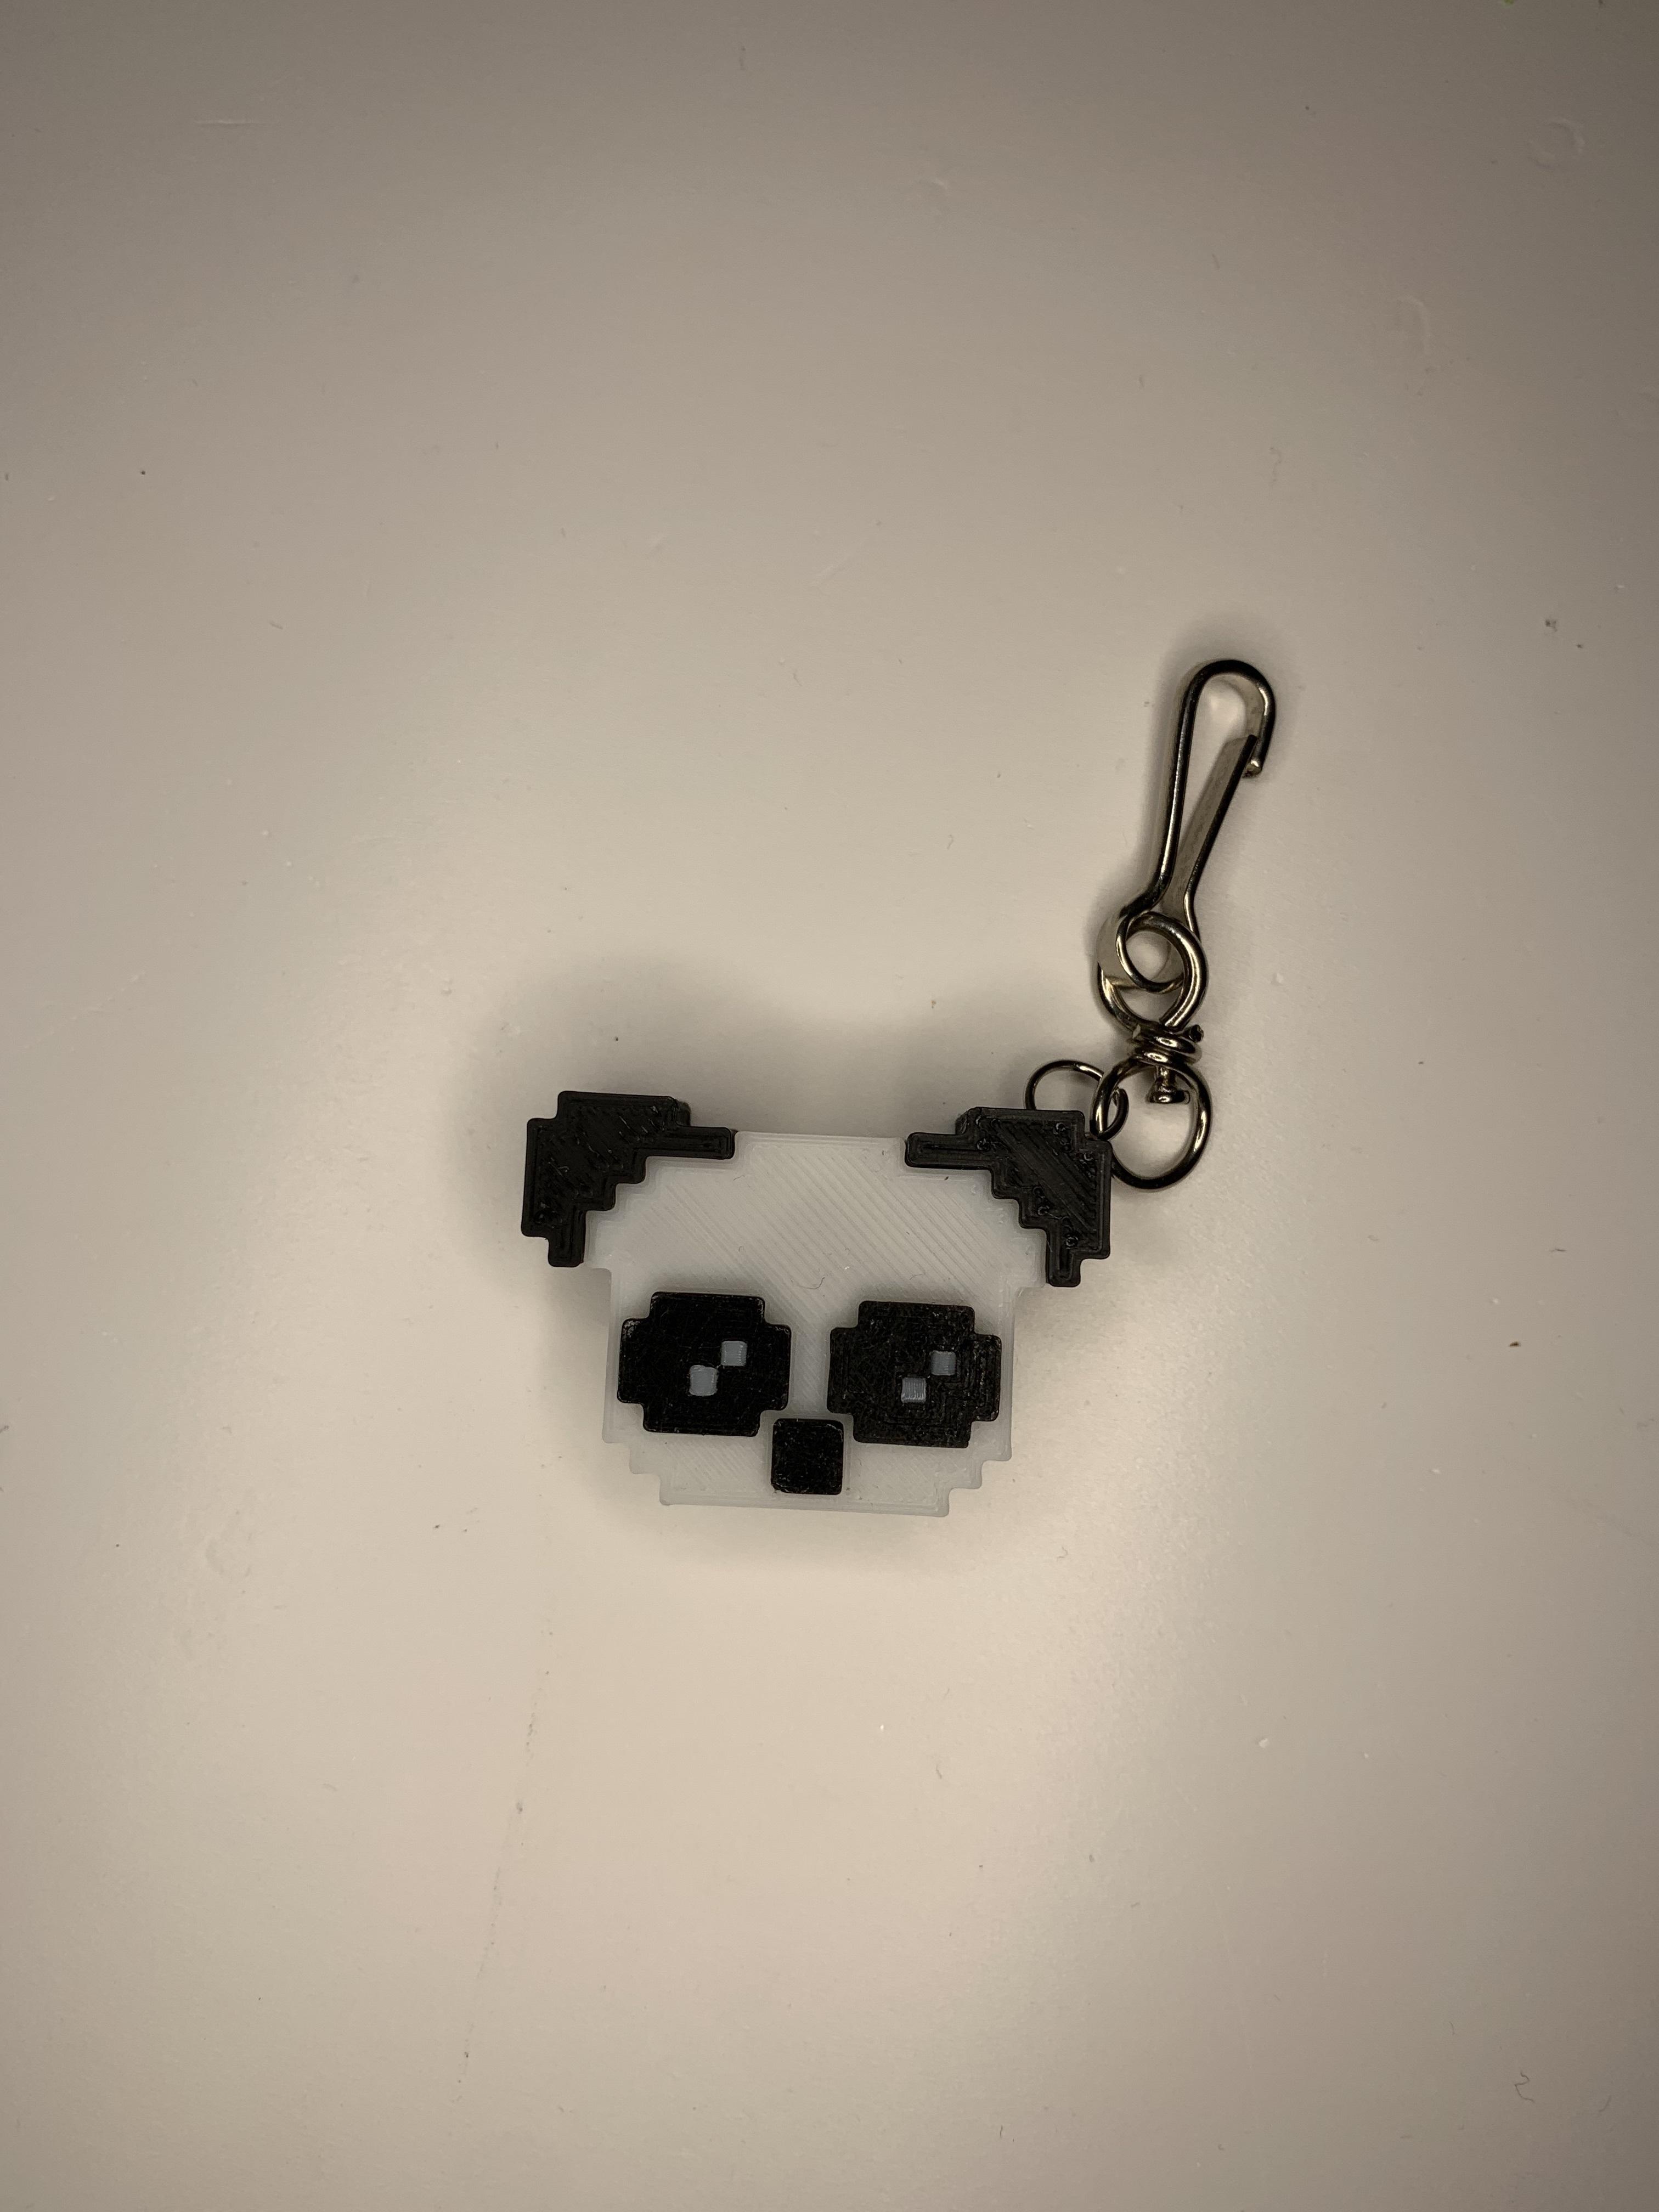 ECBA3599-6F42-4E56-A96E-7303F01A988A.jpeg Download OBJ file Panda & Keychains • 3D printable template, Ultipression3D